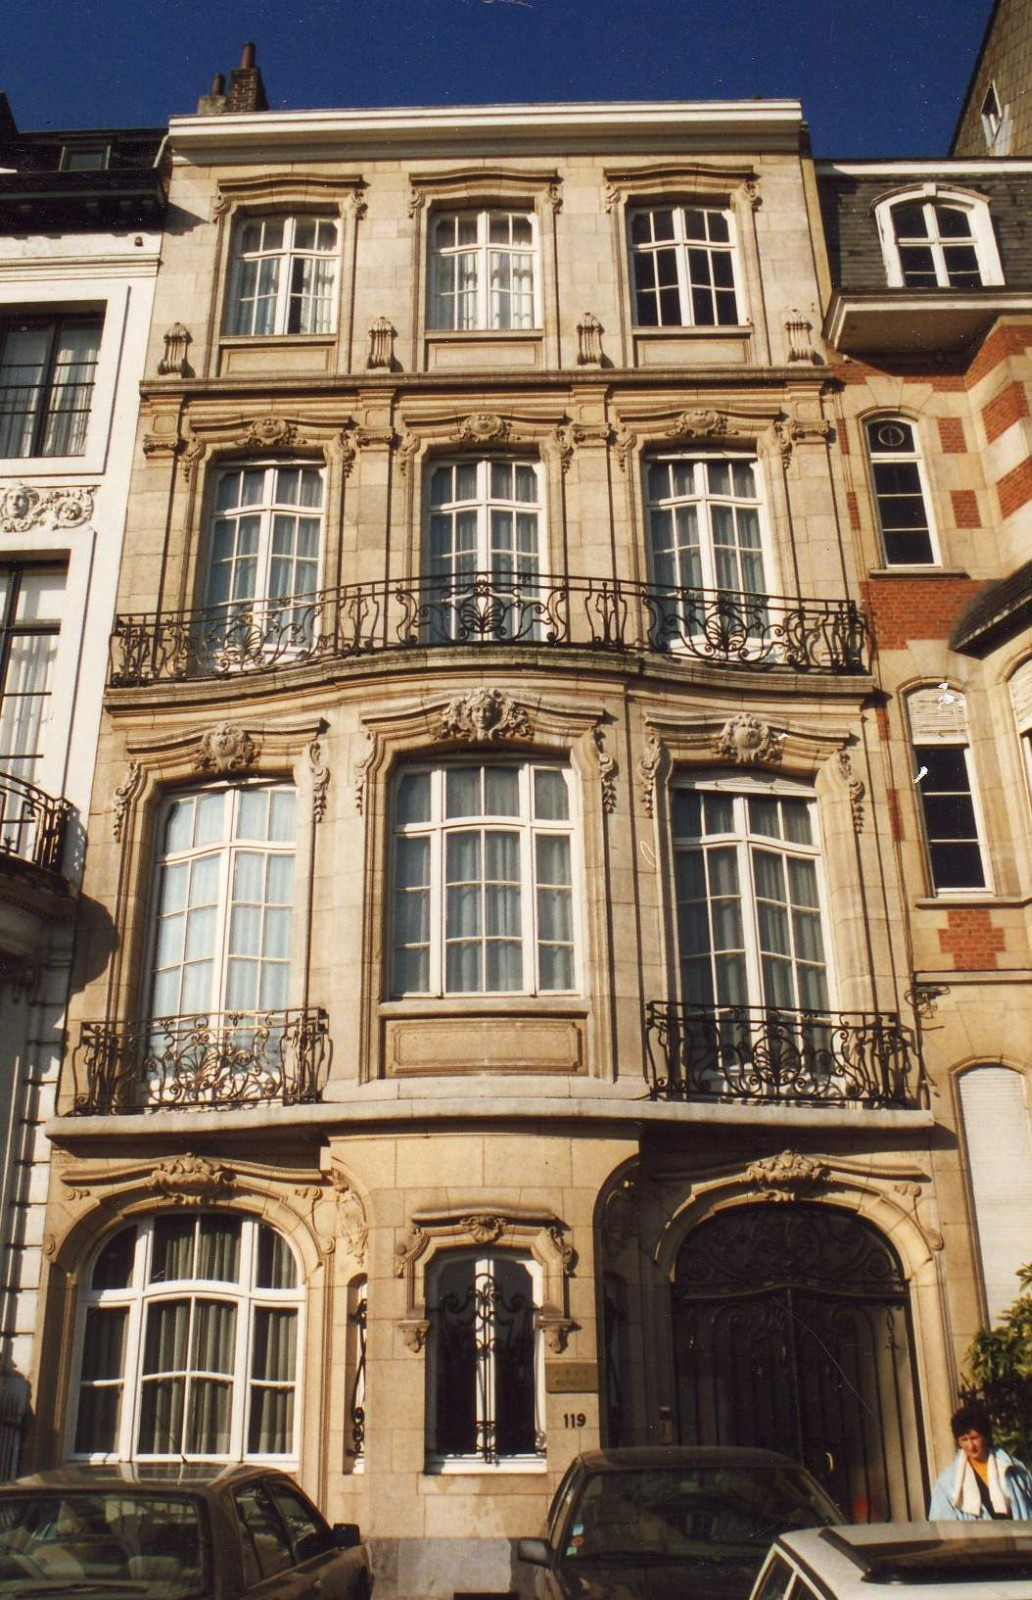 Boulevard Saint-Michel 119., 1994